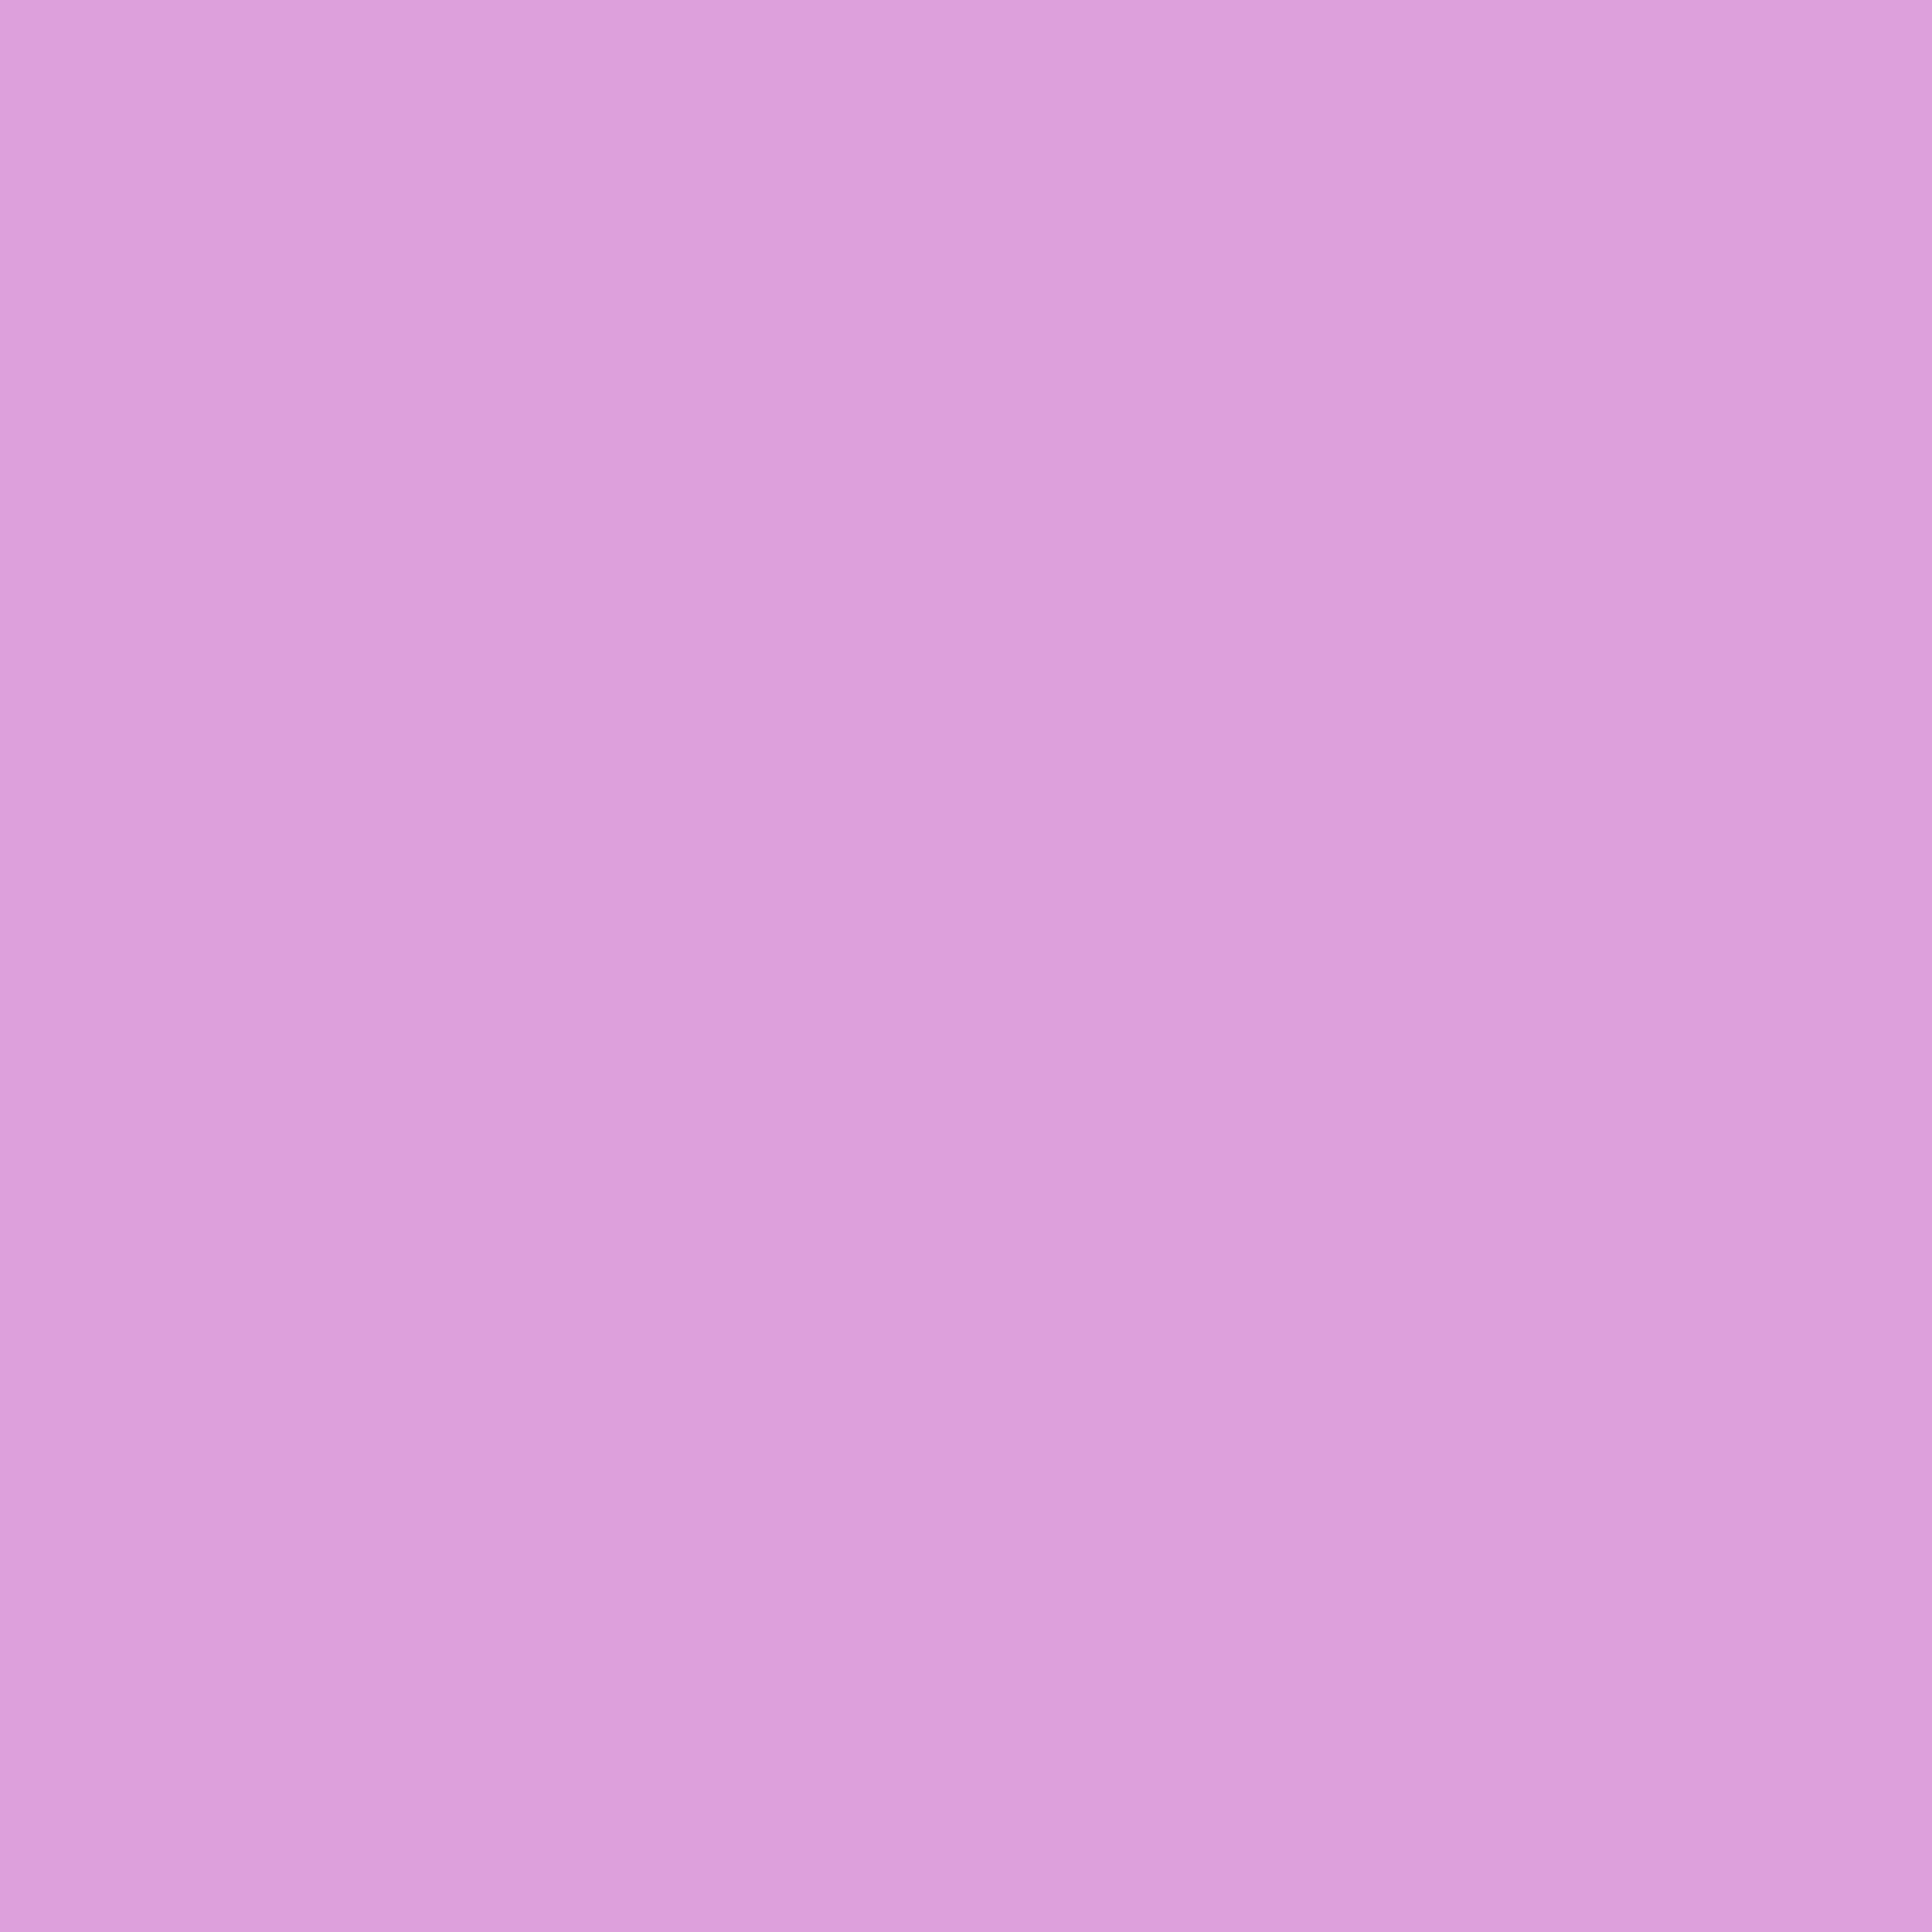 2048x2048 Medium Lavender Magenta Solid Color Background